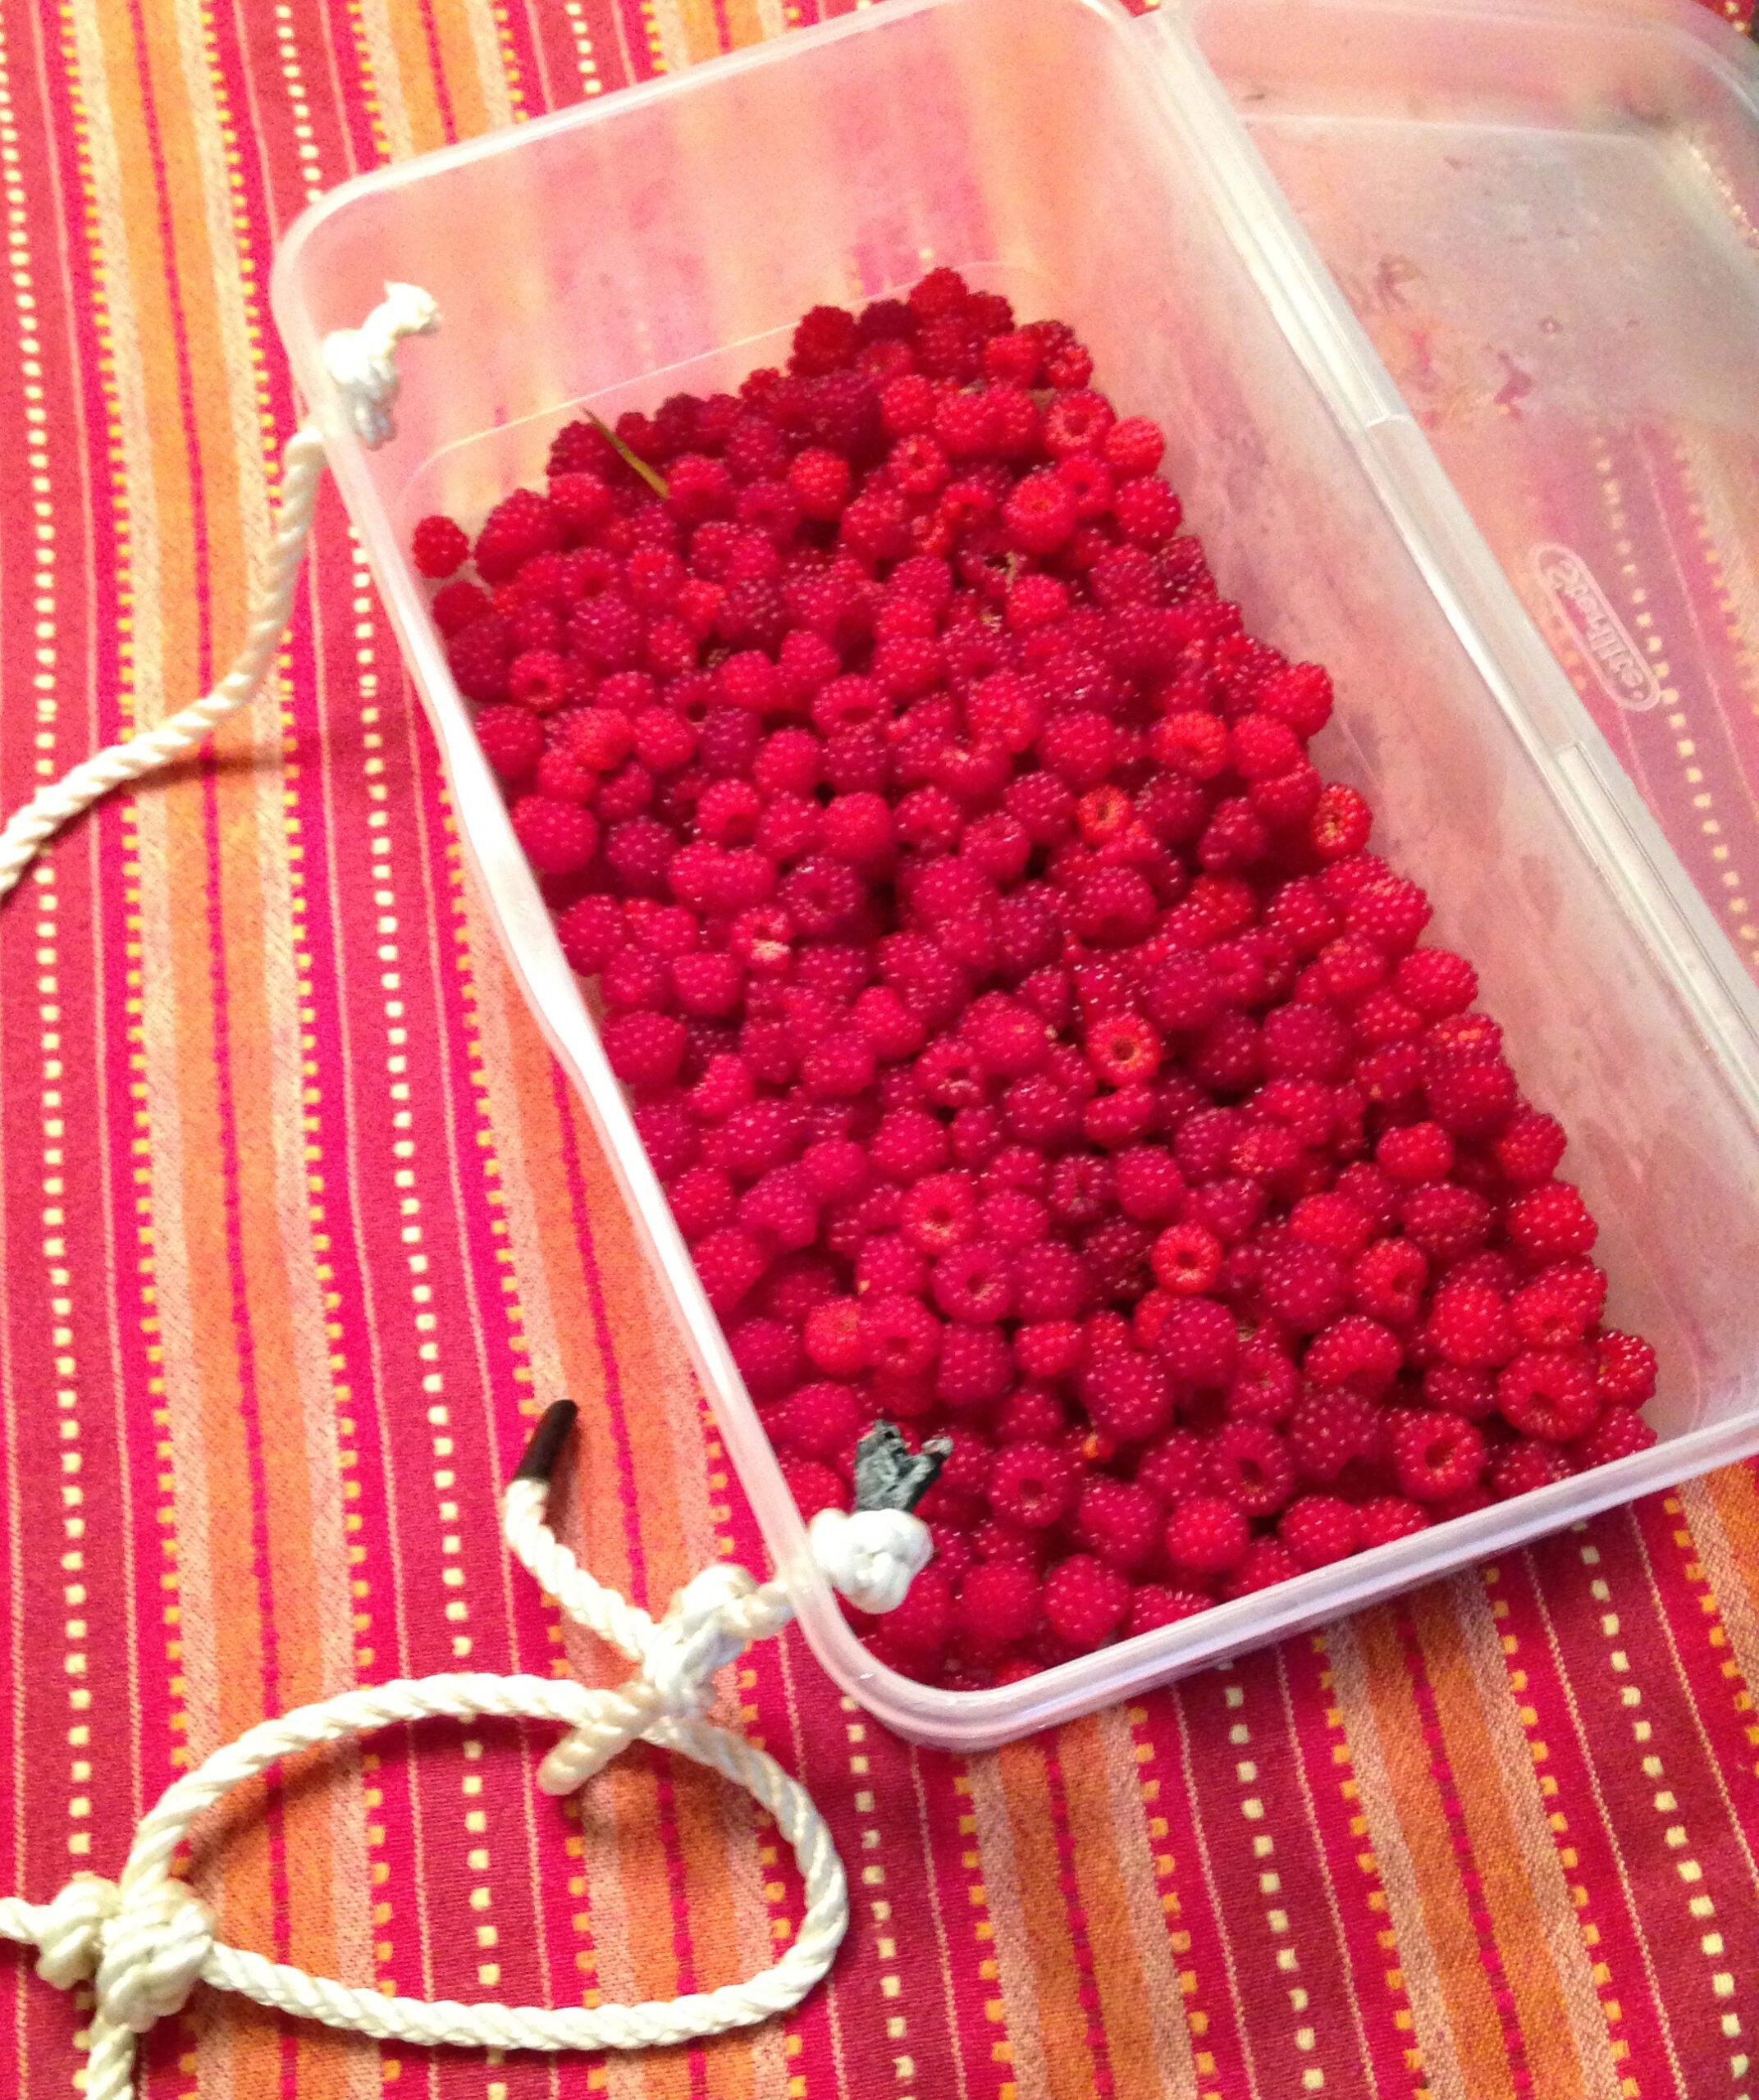 Wild Wineberries Are In Season